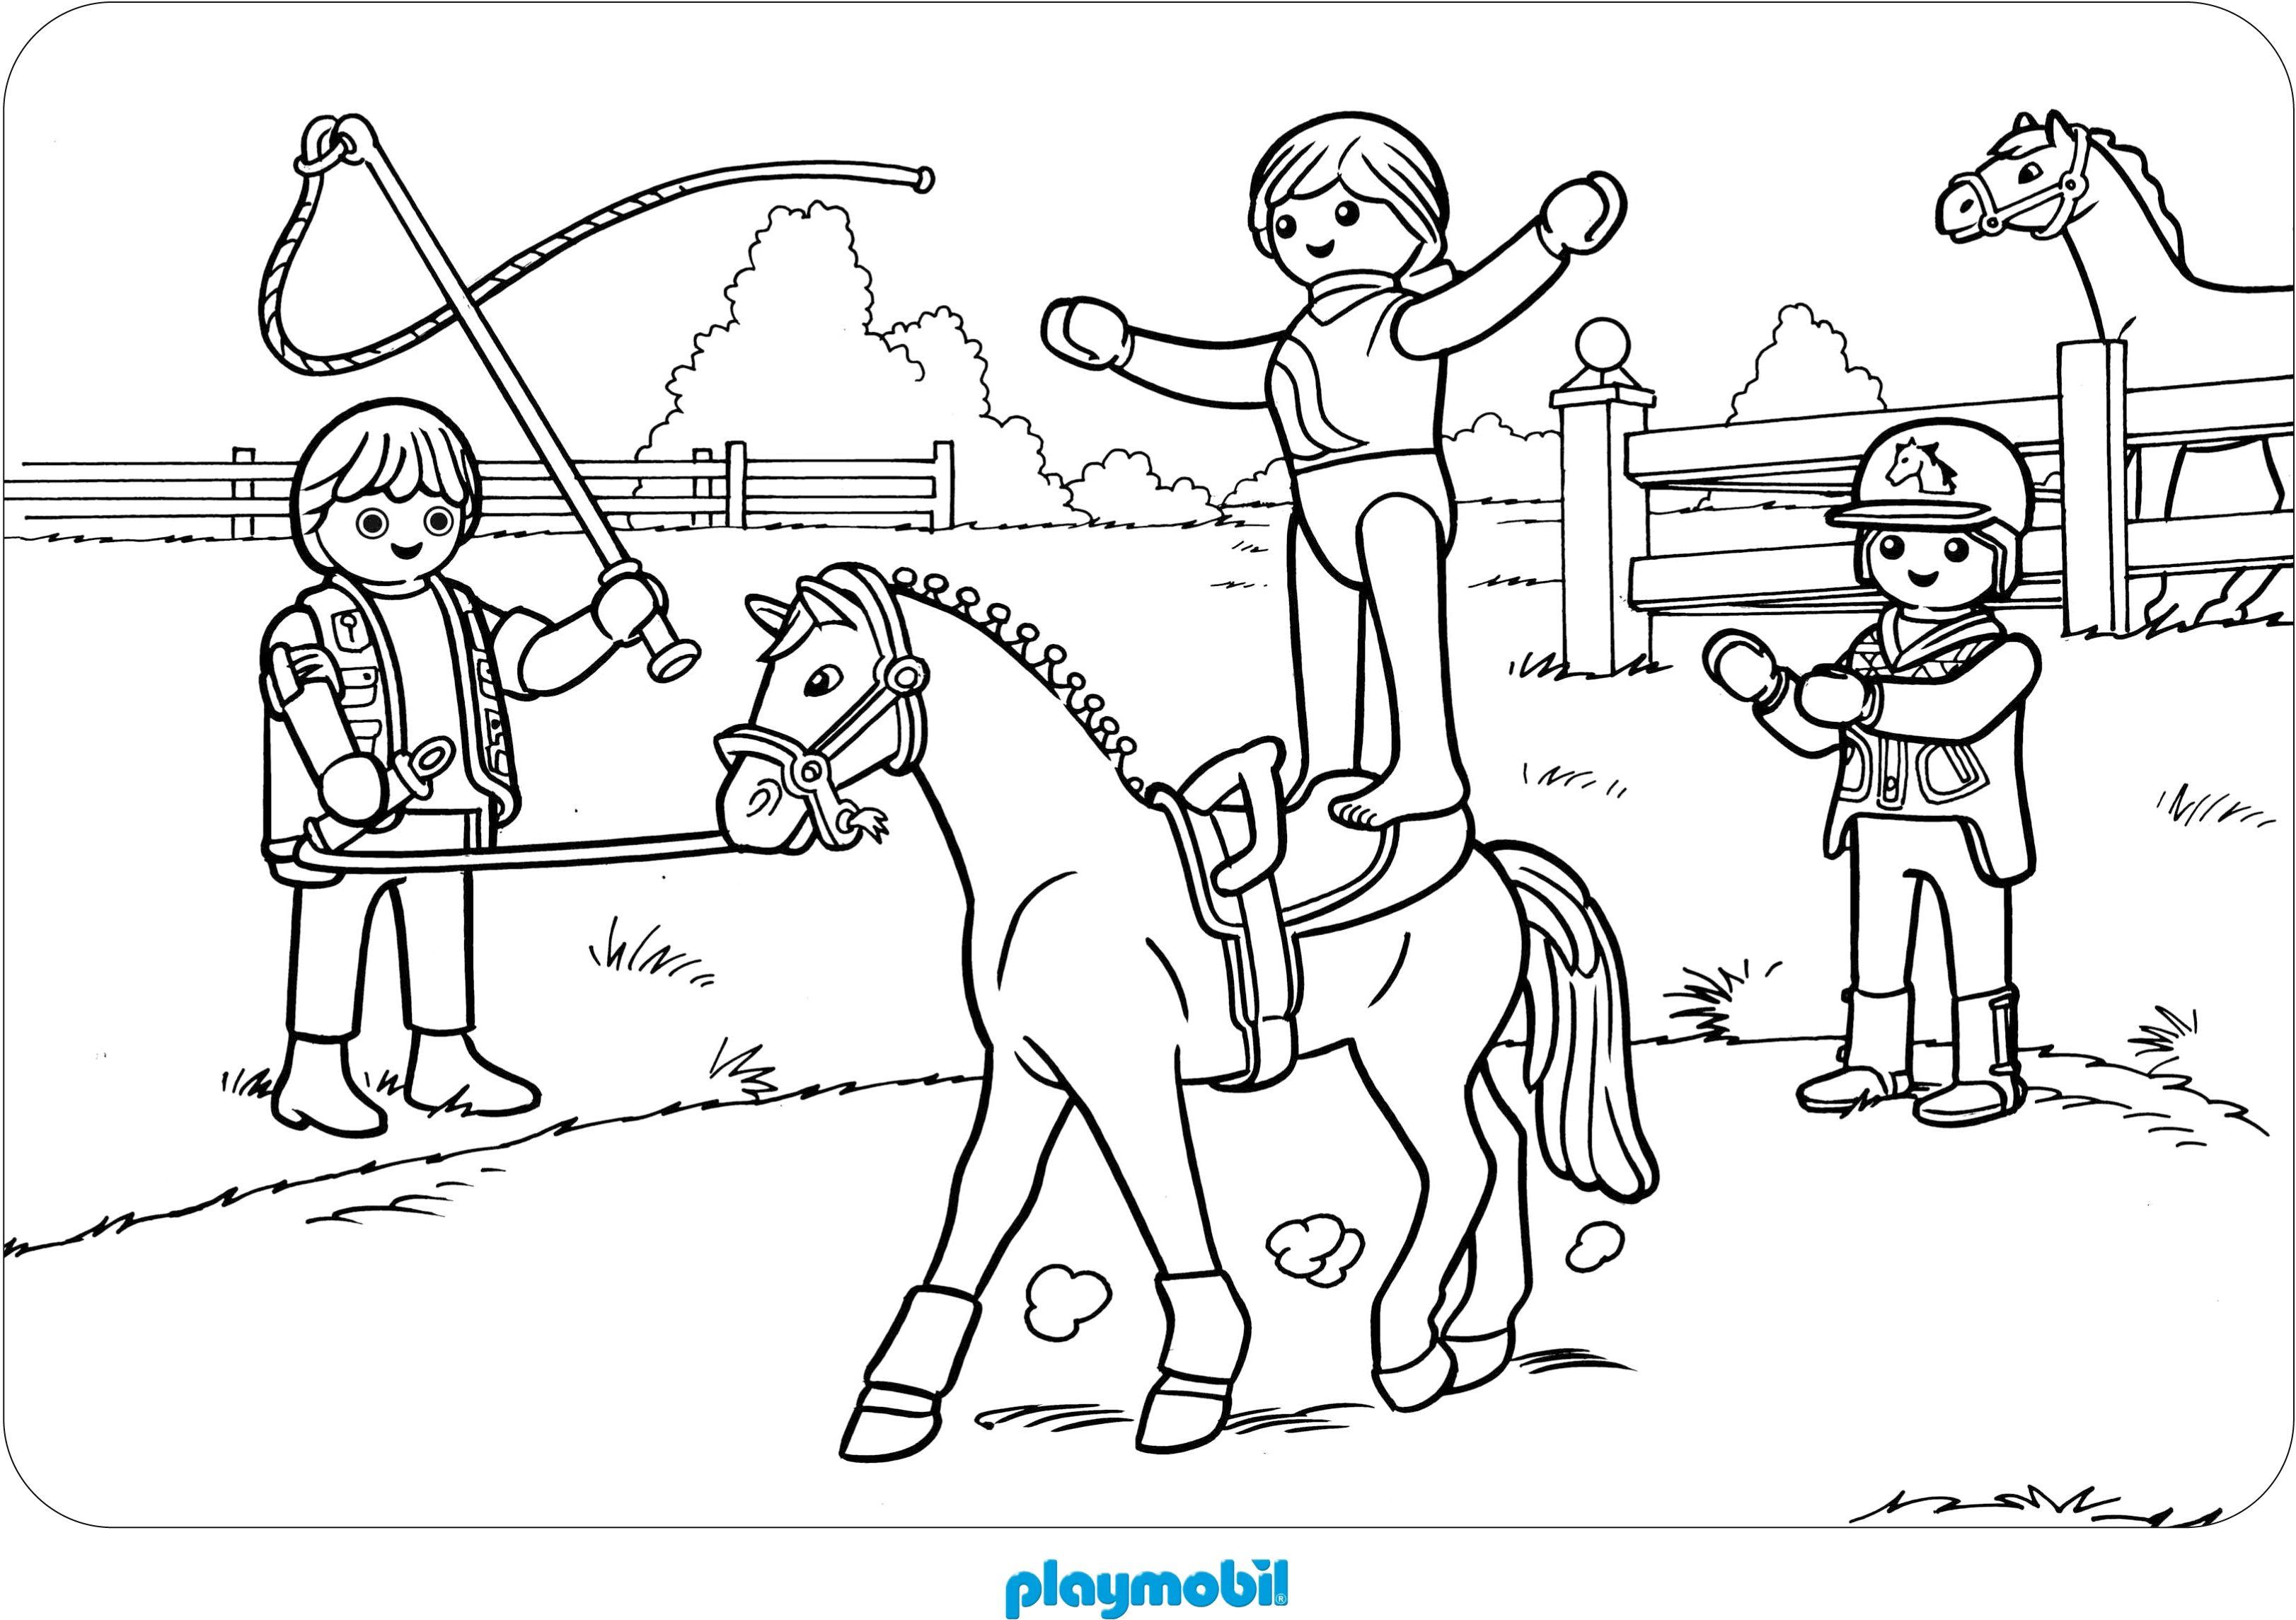 Meerjungfrau Ausmalbilder : Ausmalbilder Playmobil Ausmalbild Pferd Ausmalbilder Meerjungfrau